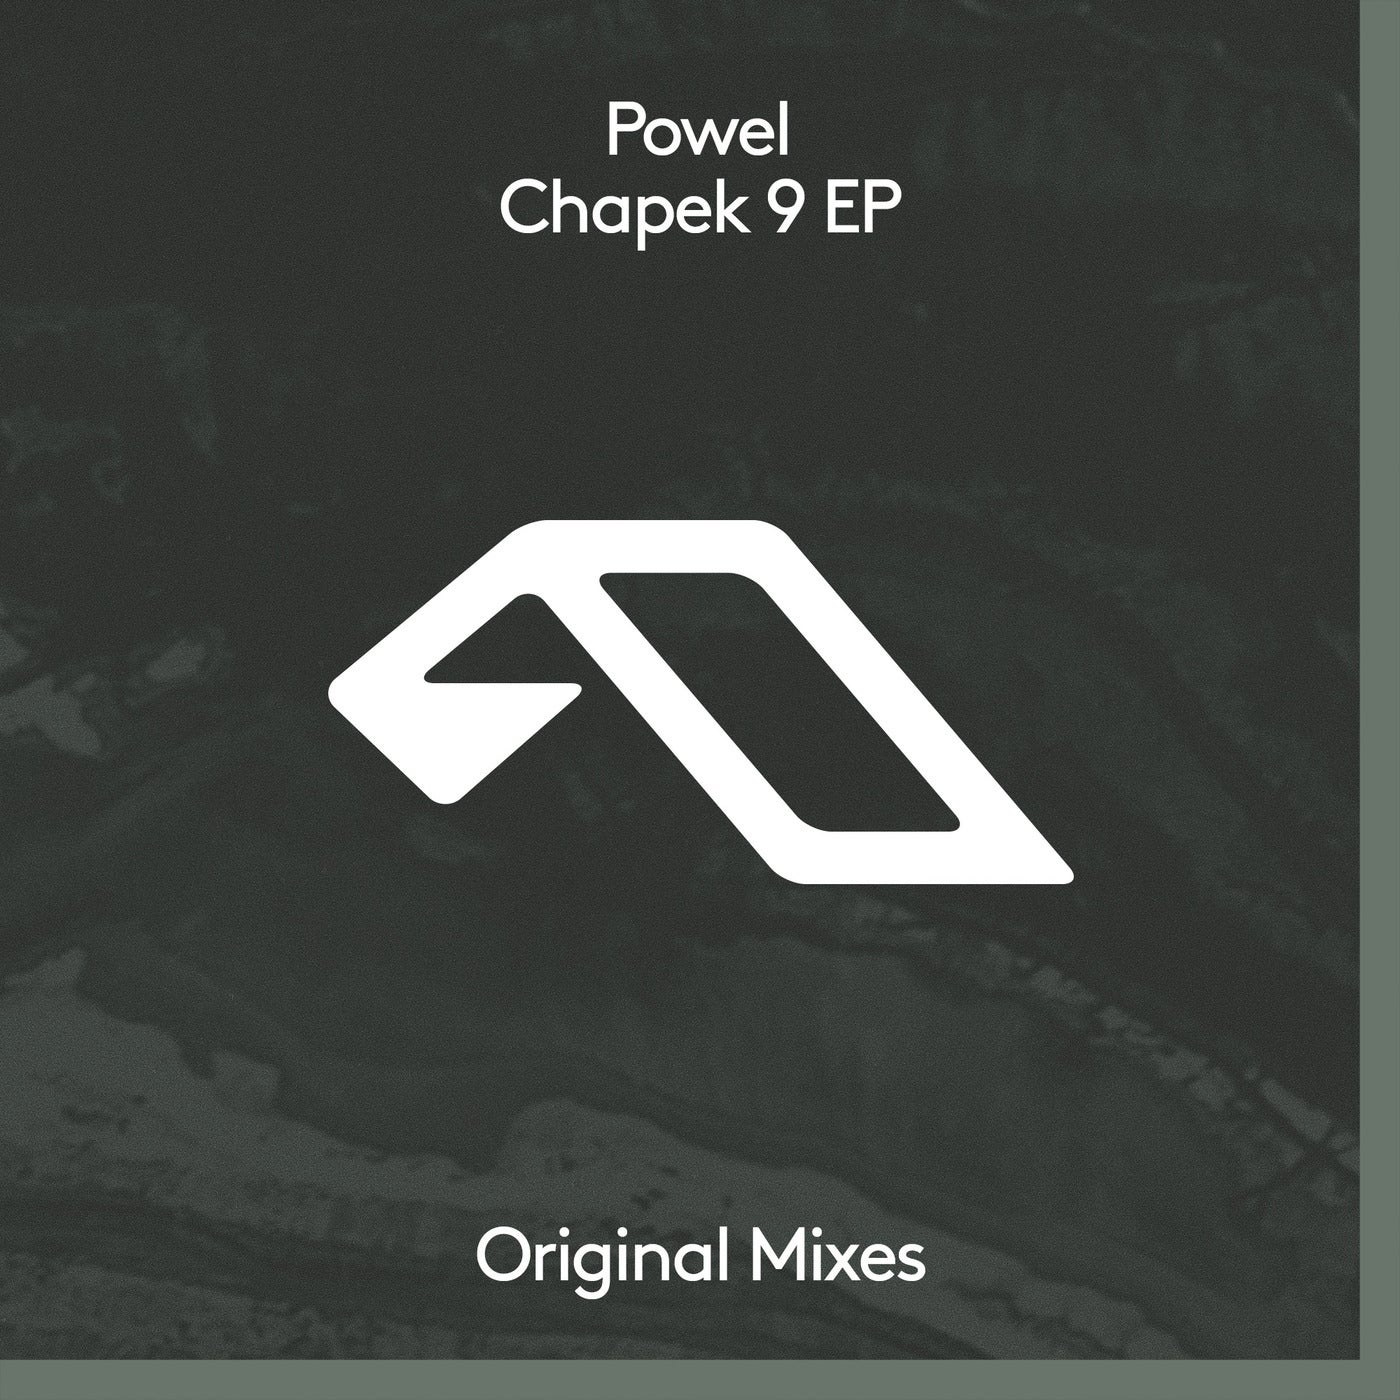 Chapek 9 EP